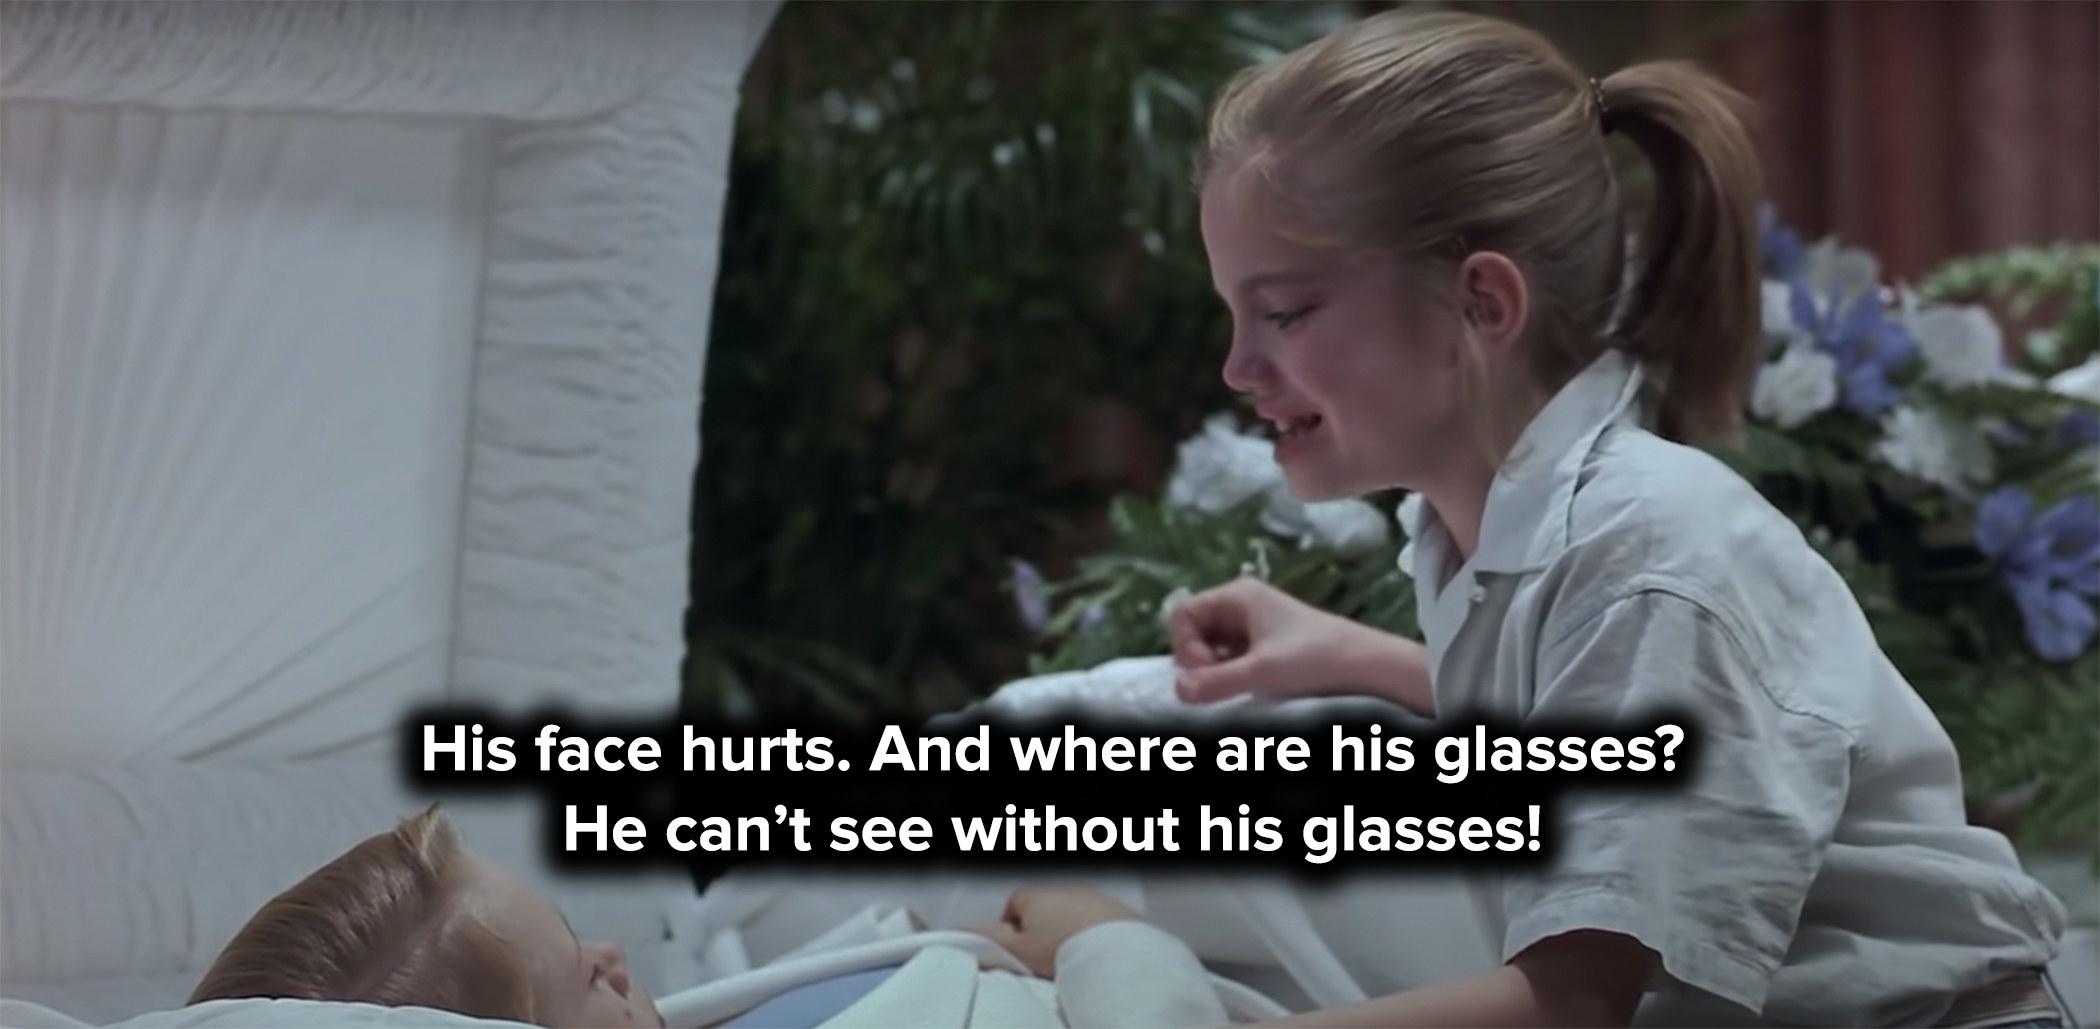 Vada cries over Thomas J's casket